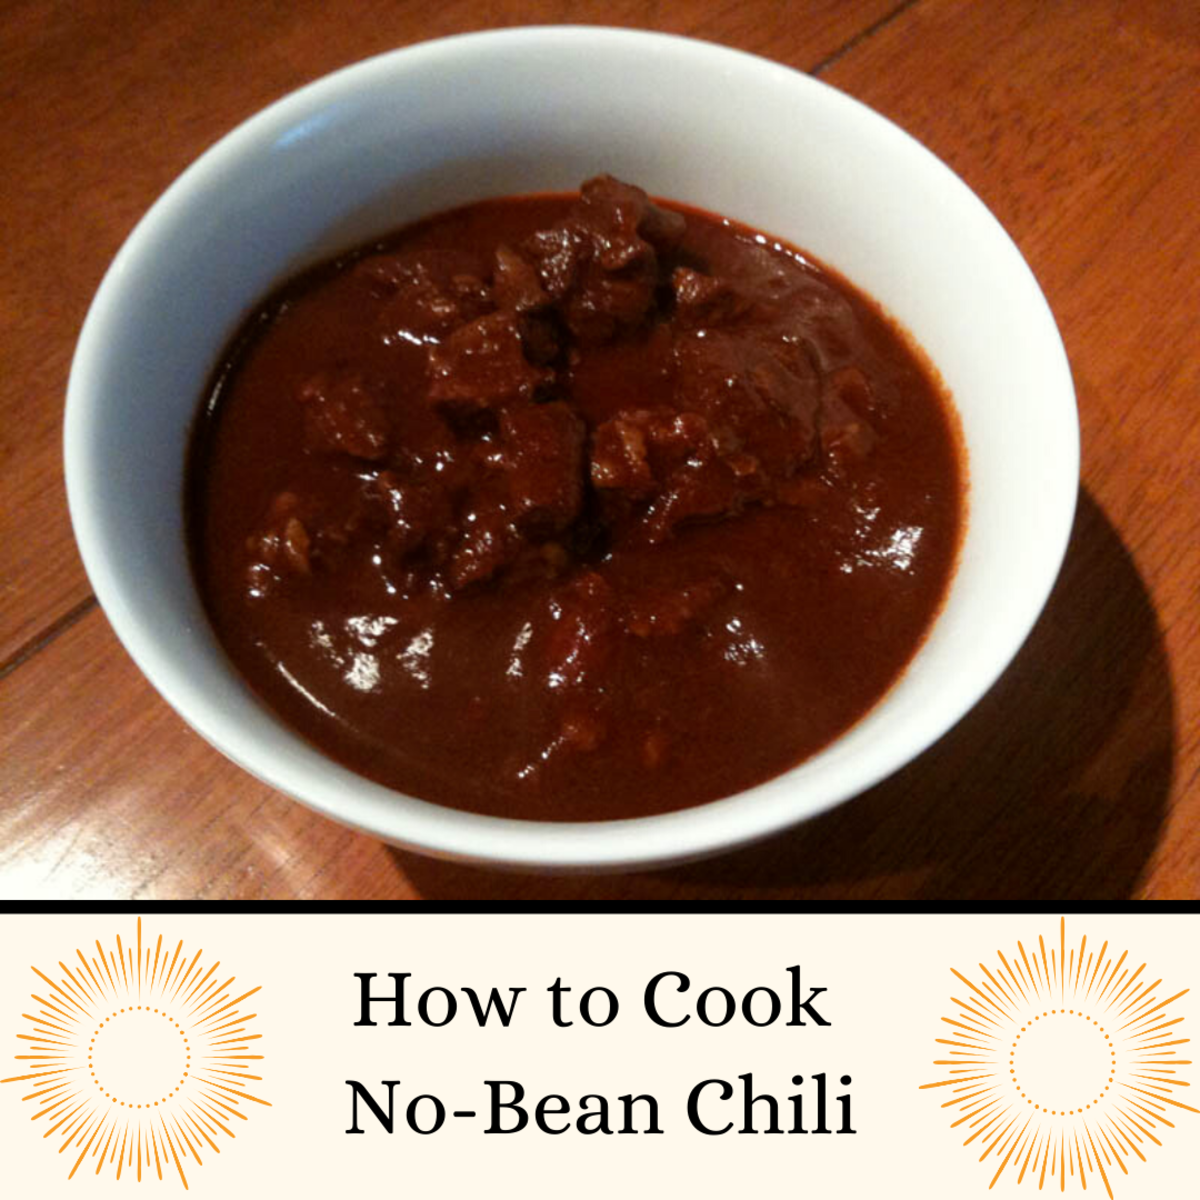 The World's Best No-Bean Chili